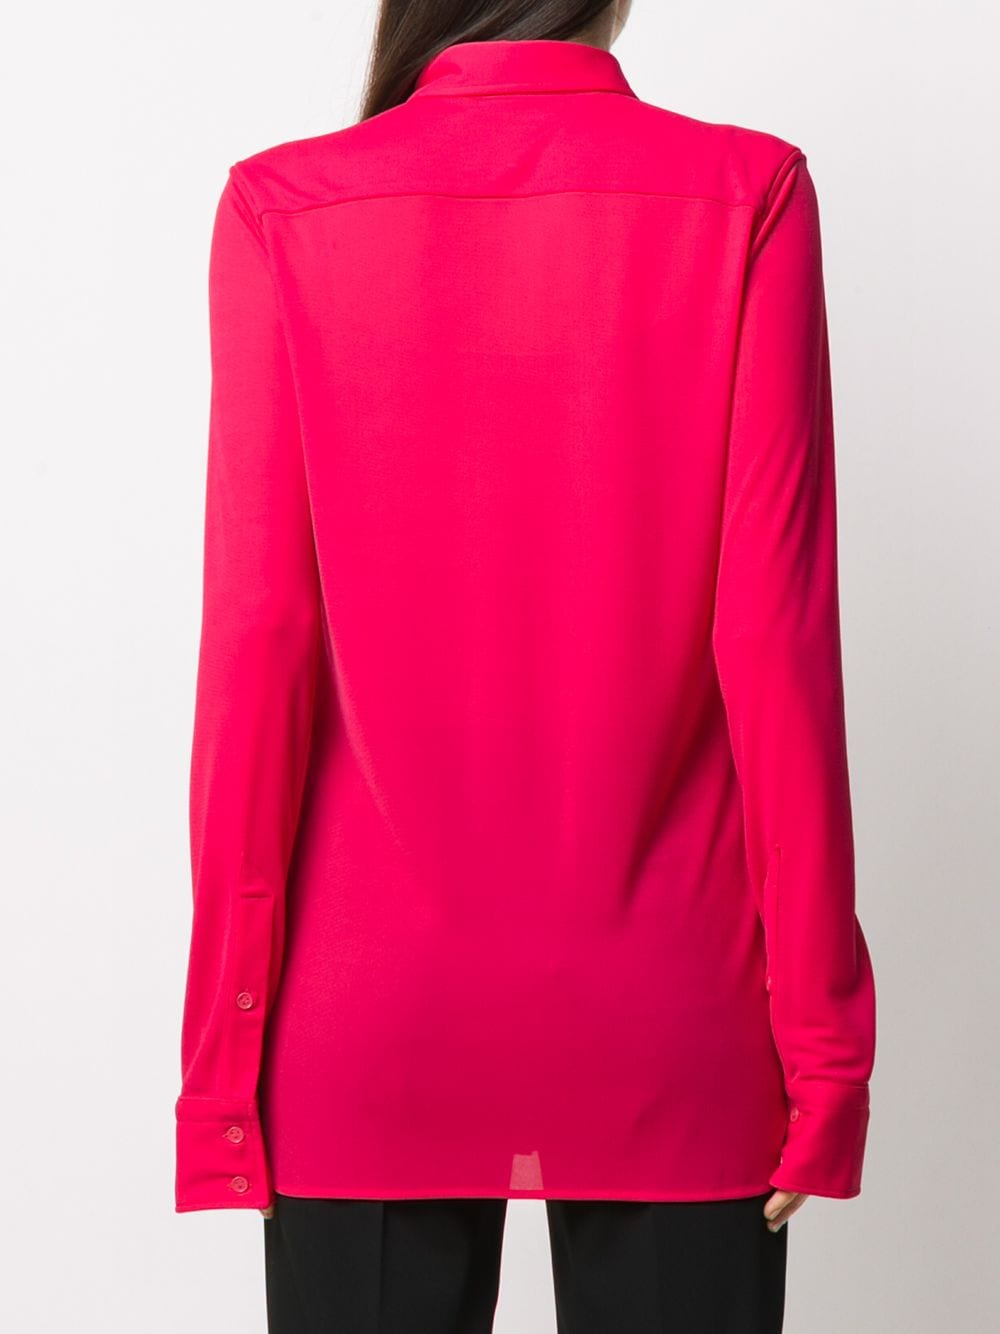 Lollipop pink semi-sheer button-up shirt featuring  spread collar BOTTEGA VENETA |  | 636591-V02I05521